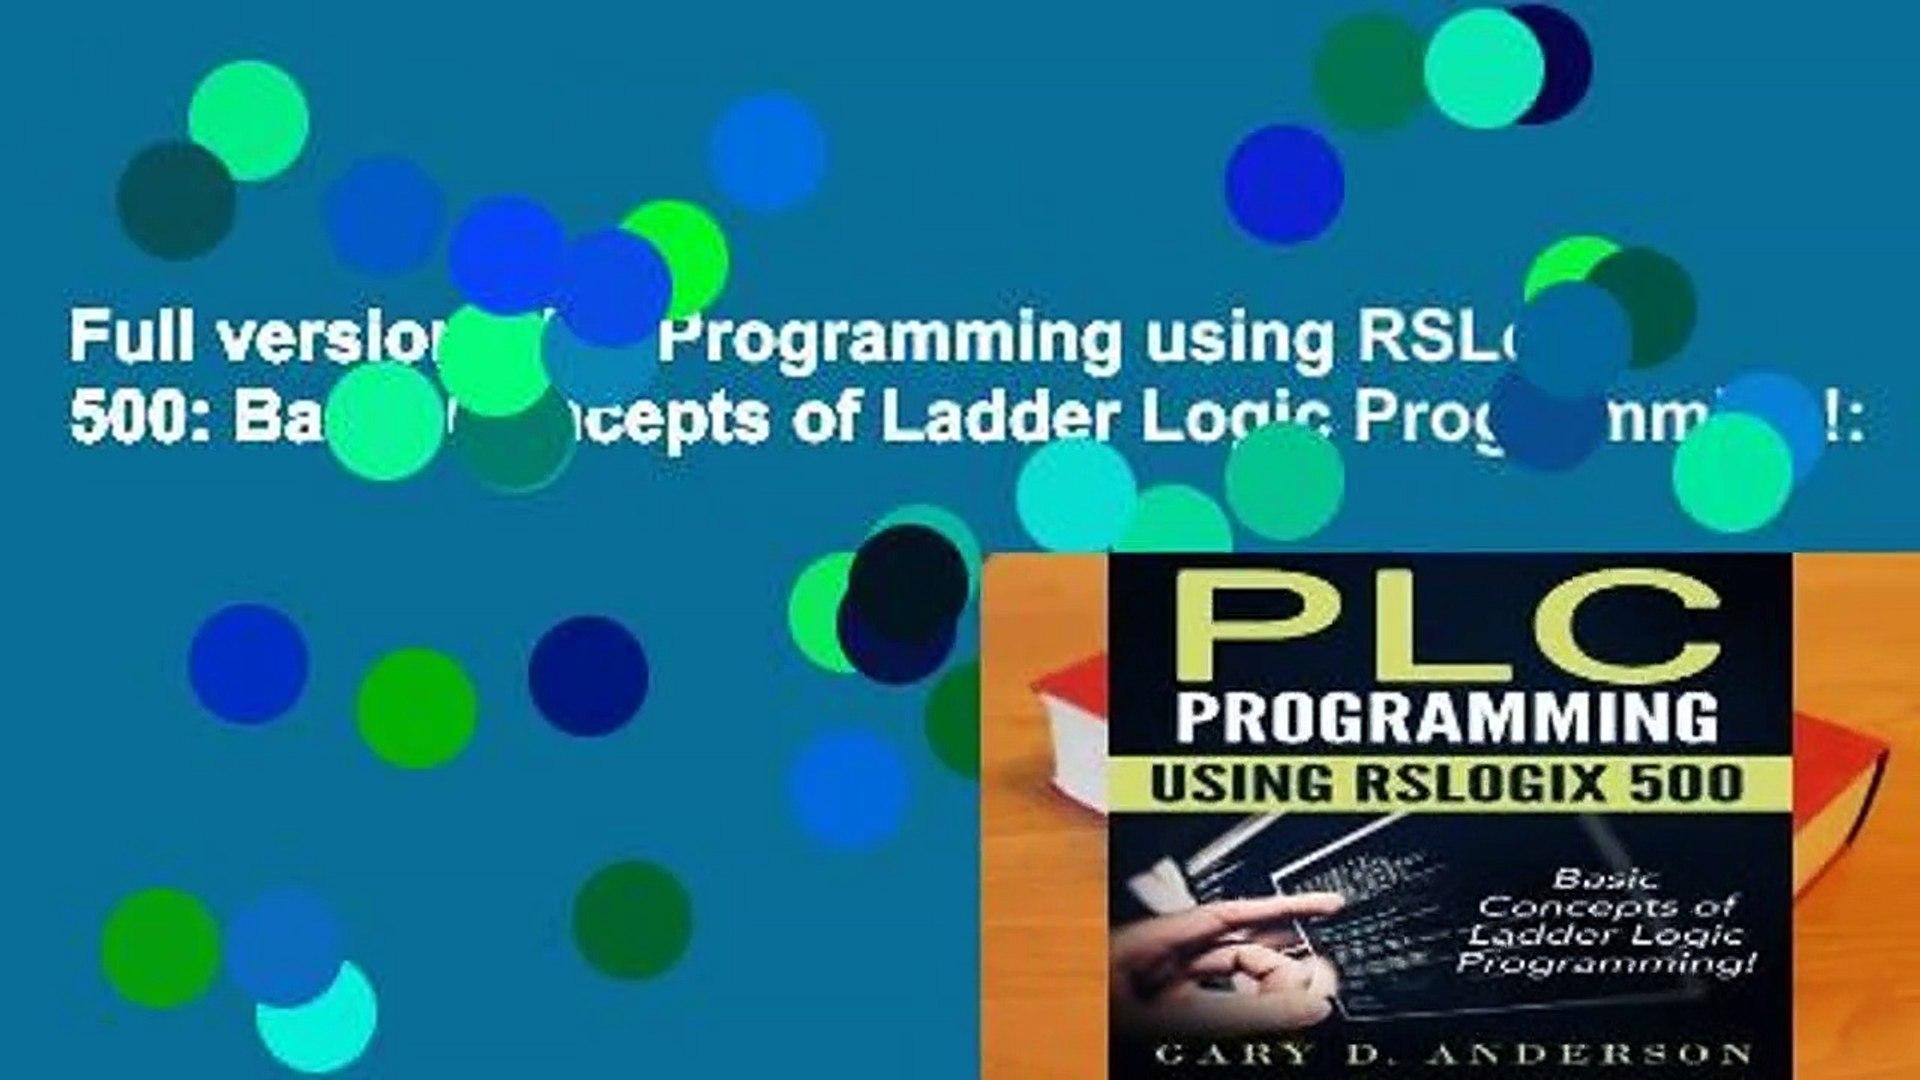 Full version PLC Programming using RSLogix 500: Basic Concepts of Ladder  Logic Programming!: